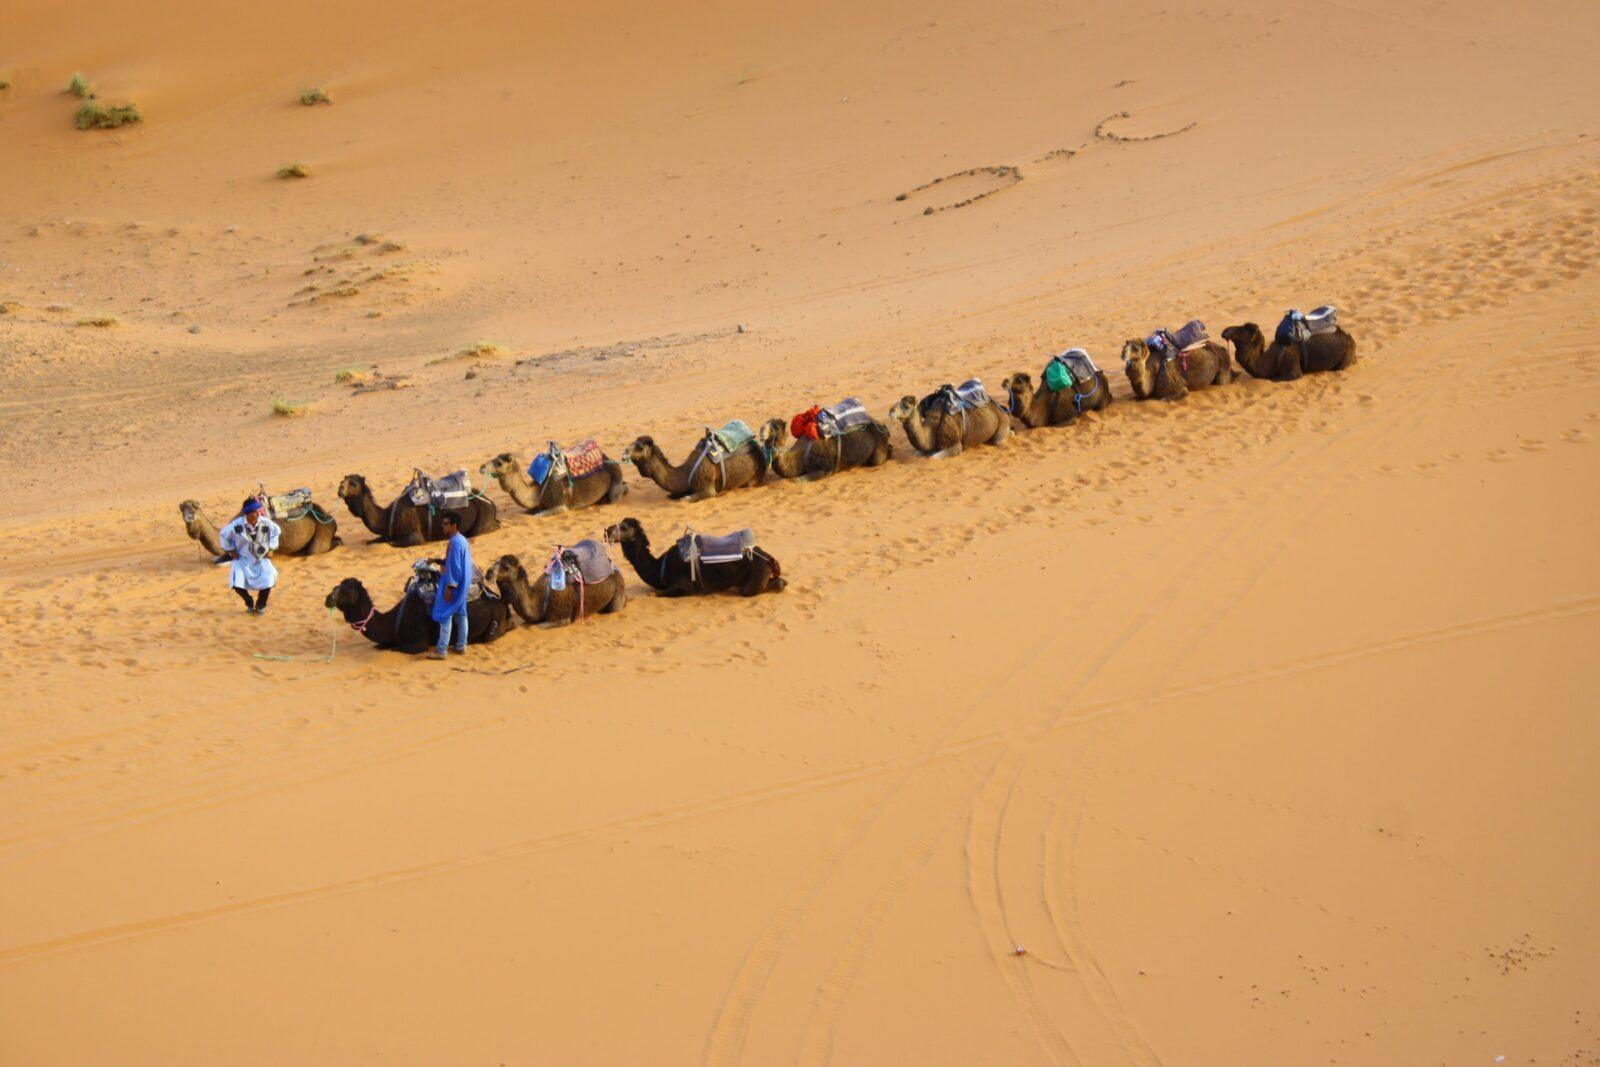 savvas kalimeris 56VKUQSsdPU unsplash 1 1536x1024 - Guide Morocco Tours